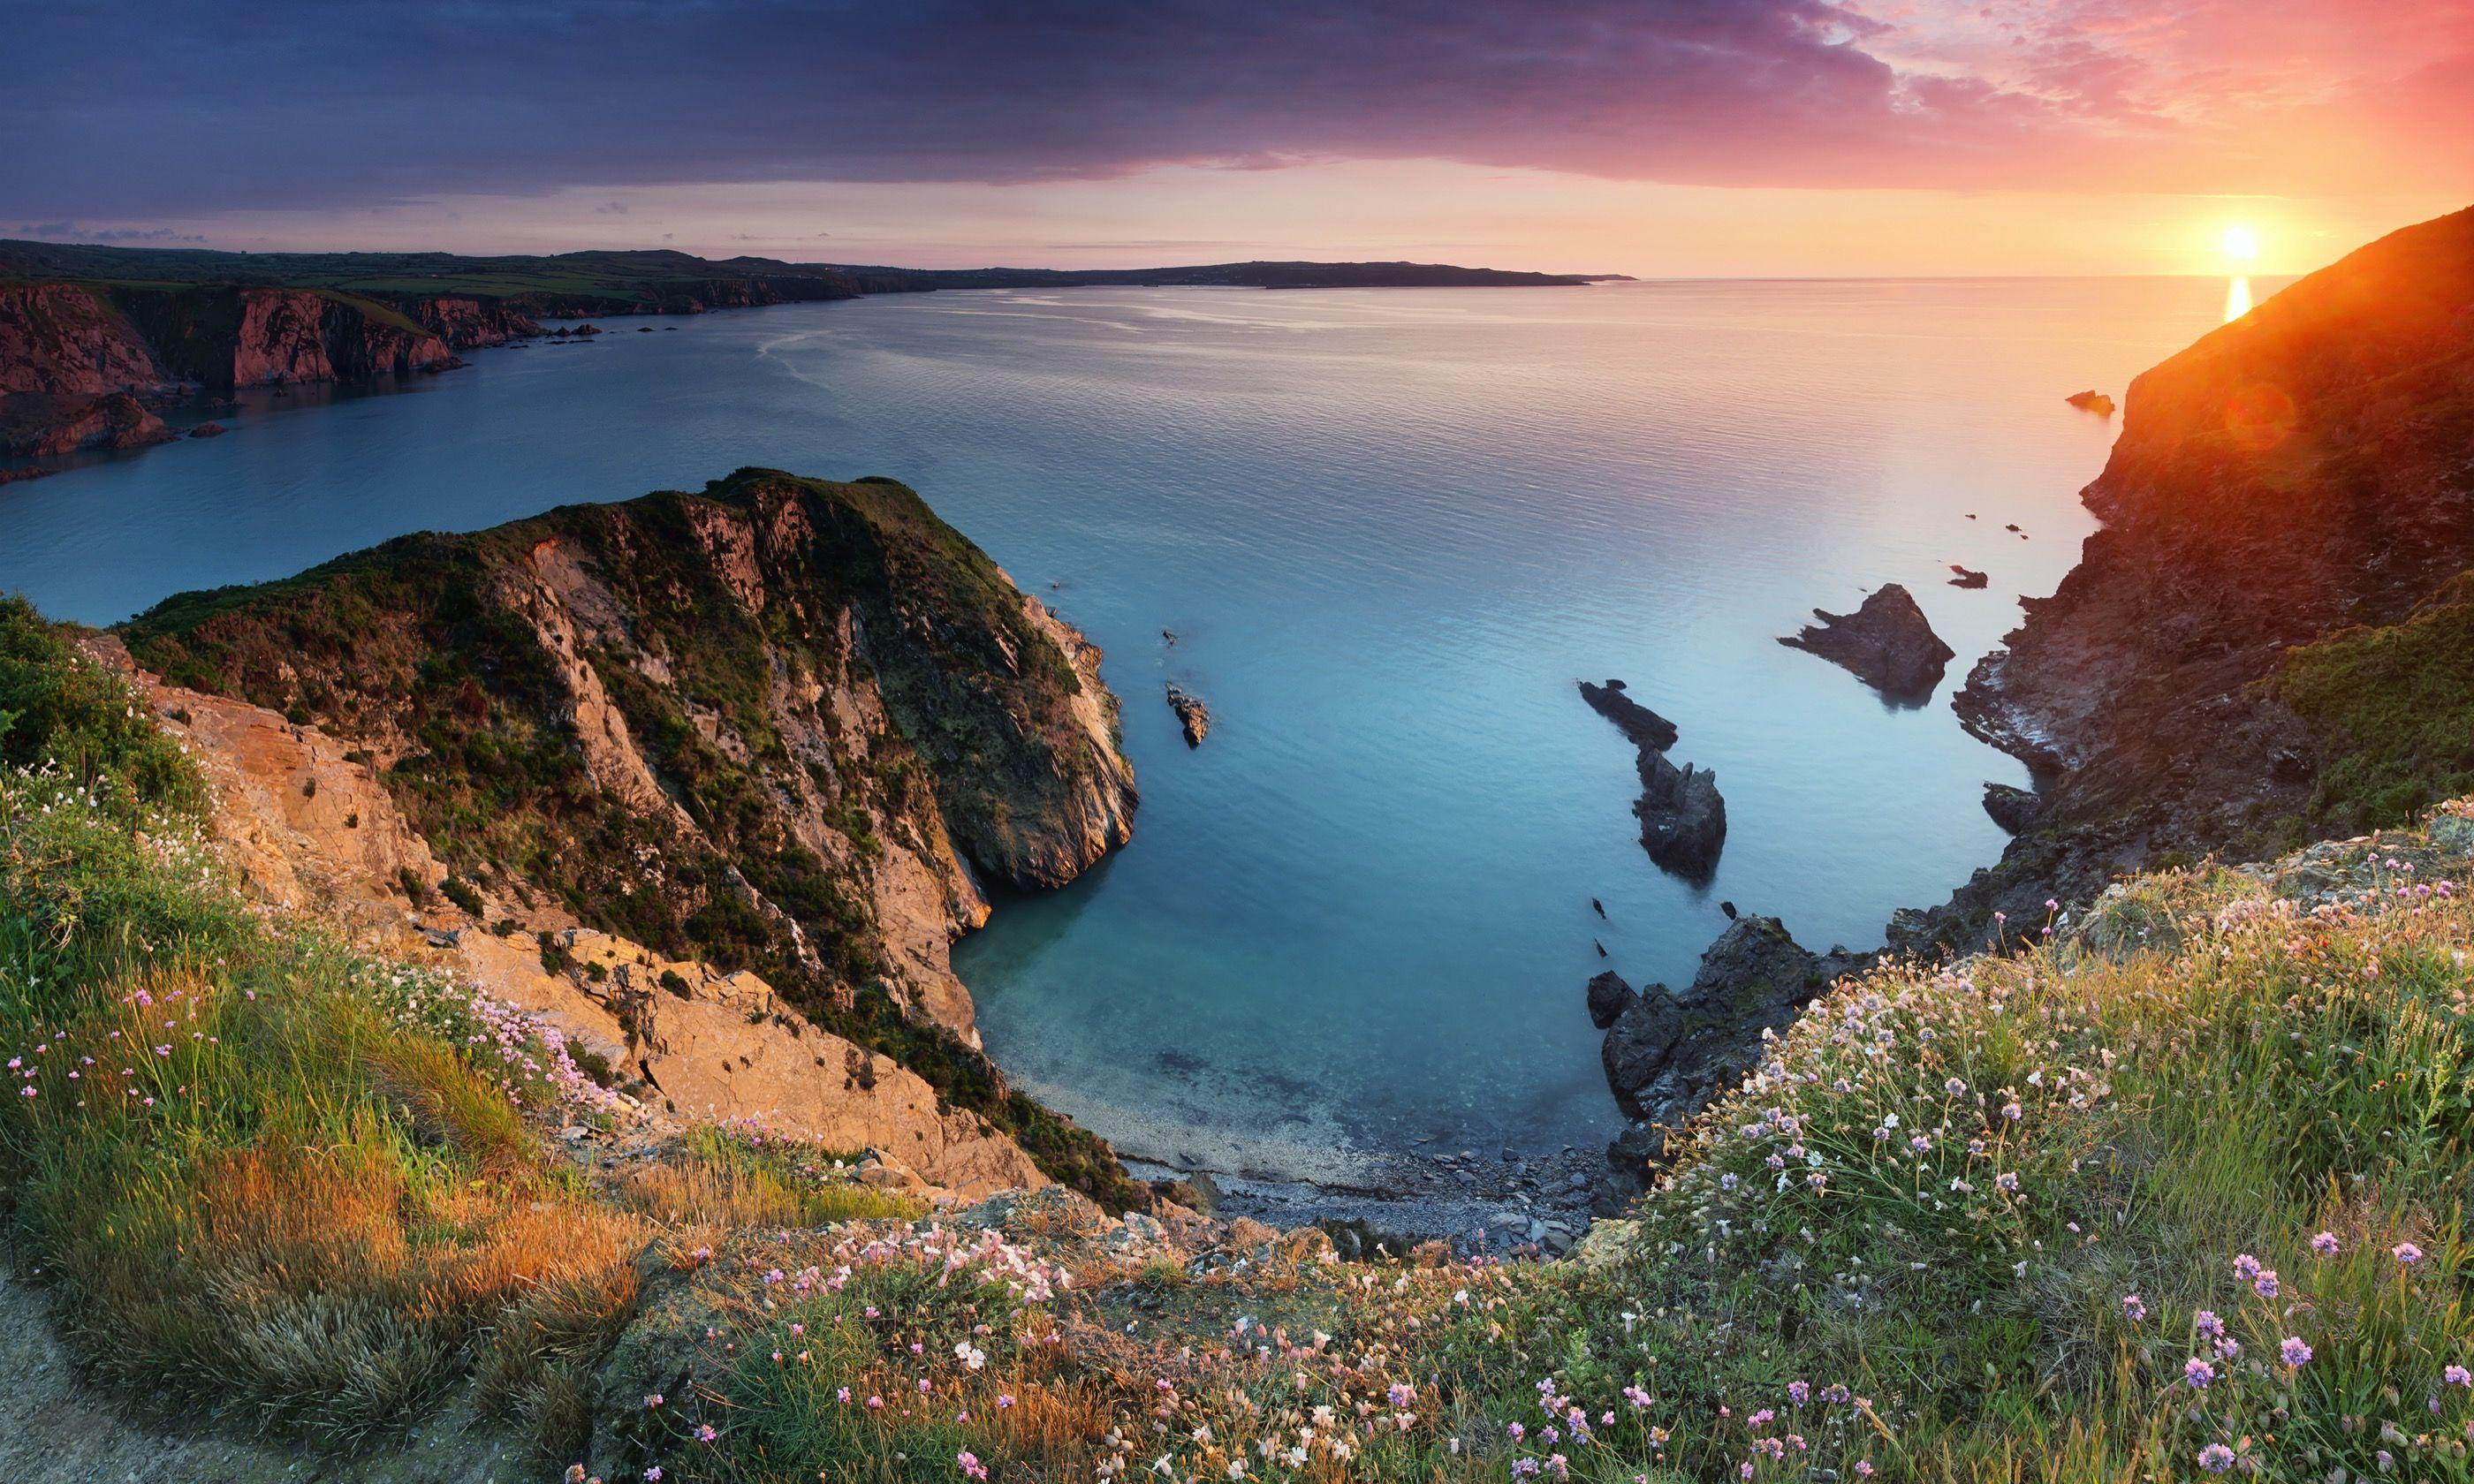 Sunset on the Pembrokeshire Coast (Dreamstime)